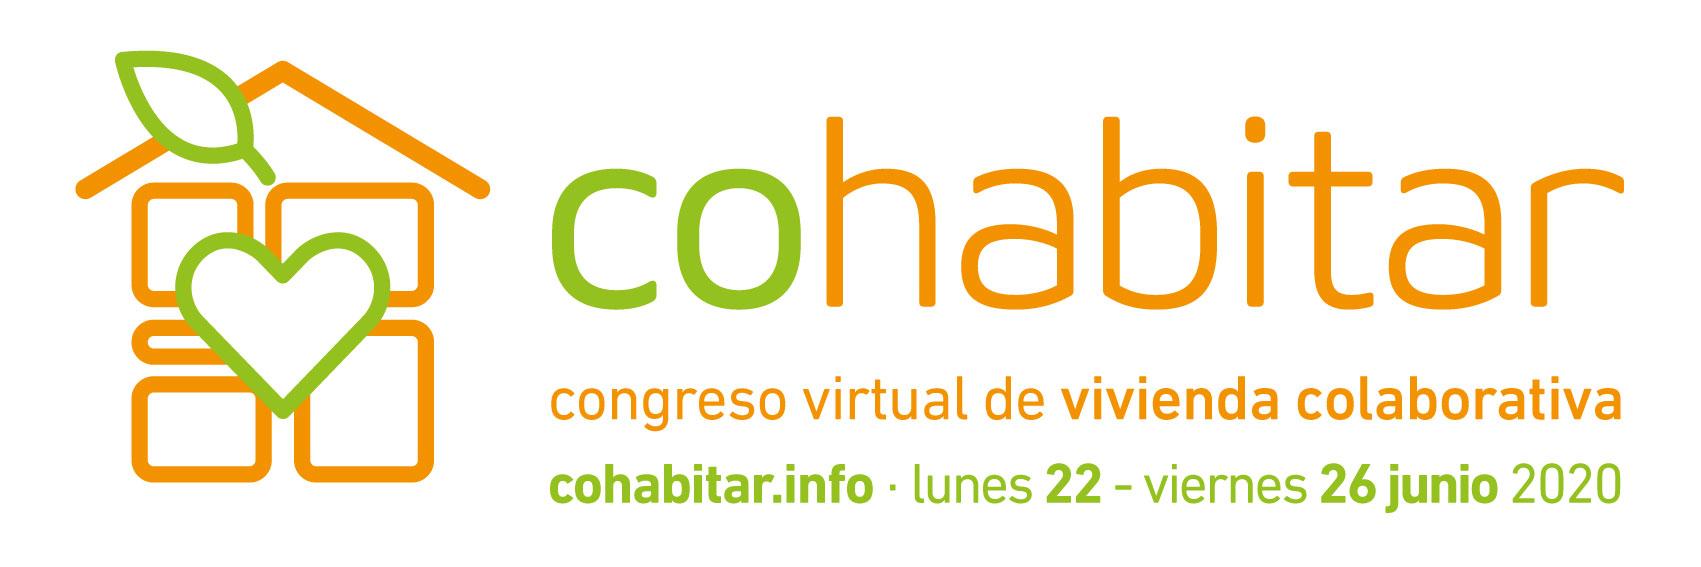 cohabitar congreso virtual vivienda colaborativa cohousing ariwake